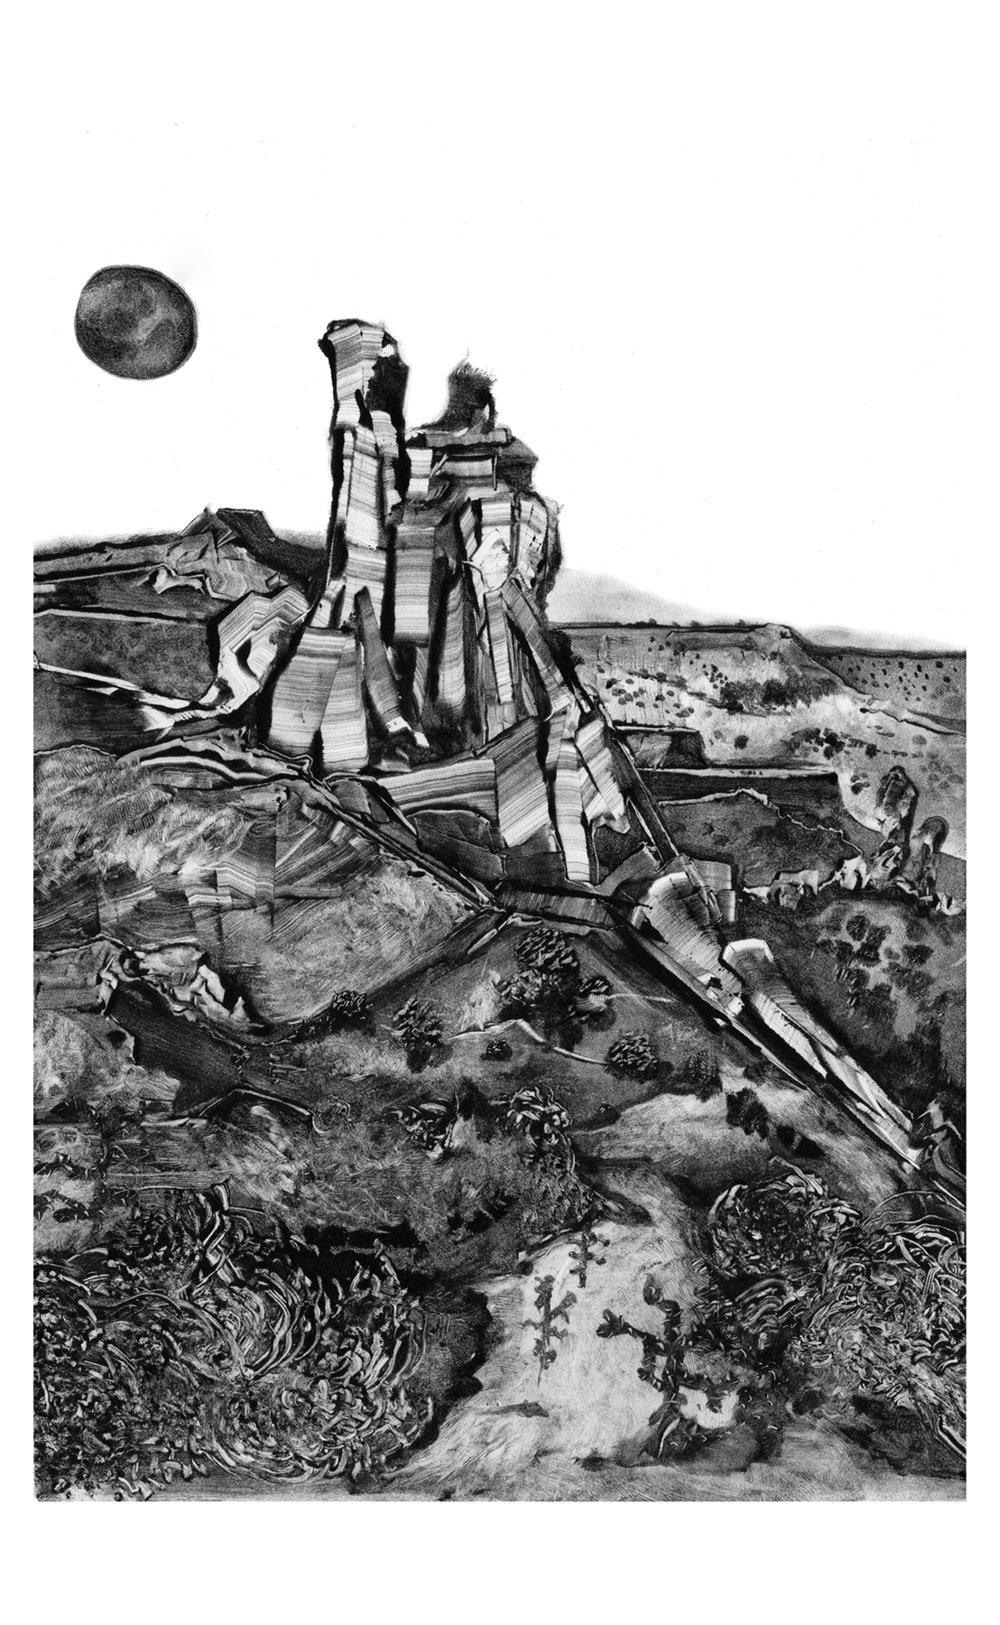 Vista in New Mexico by Grady Gordon